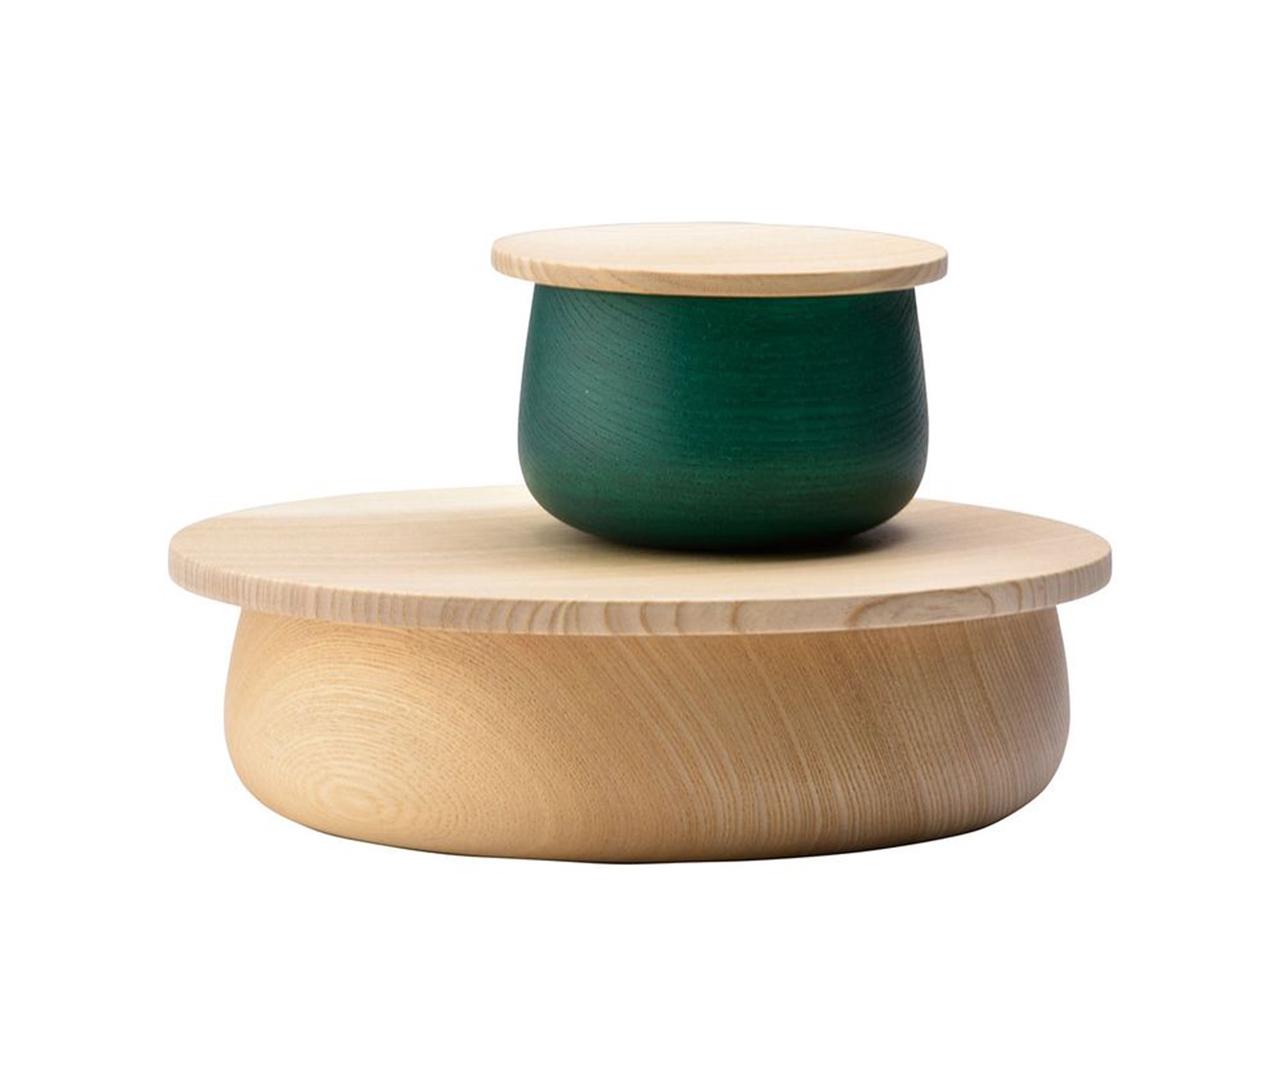 amazing boites en bois trico by the wonder with table basse designer japonais. Black Bedroom Furniture Sets. Home Design Ideas